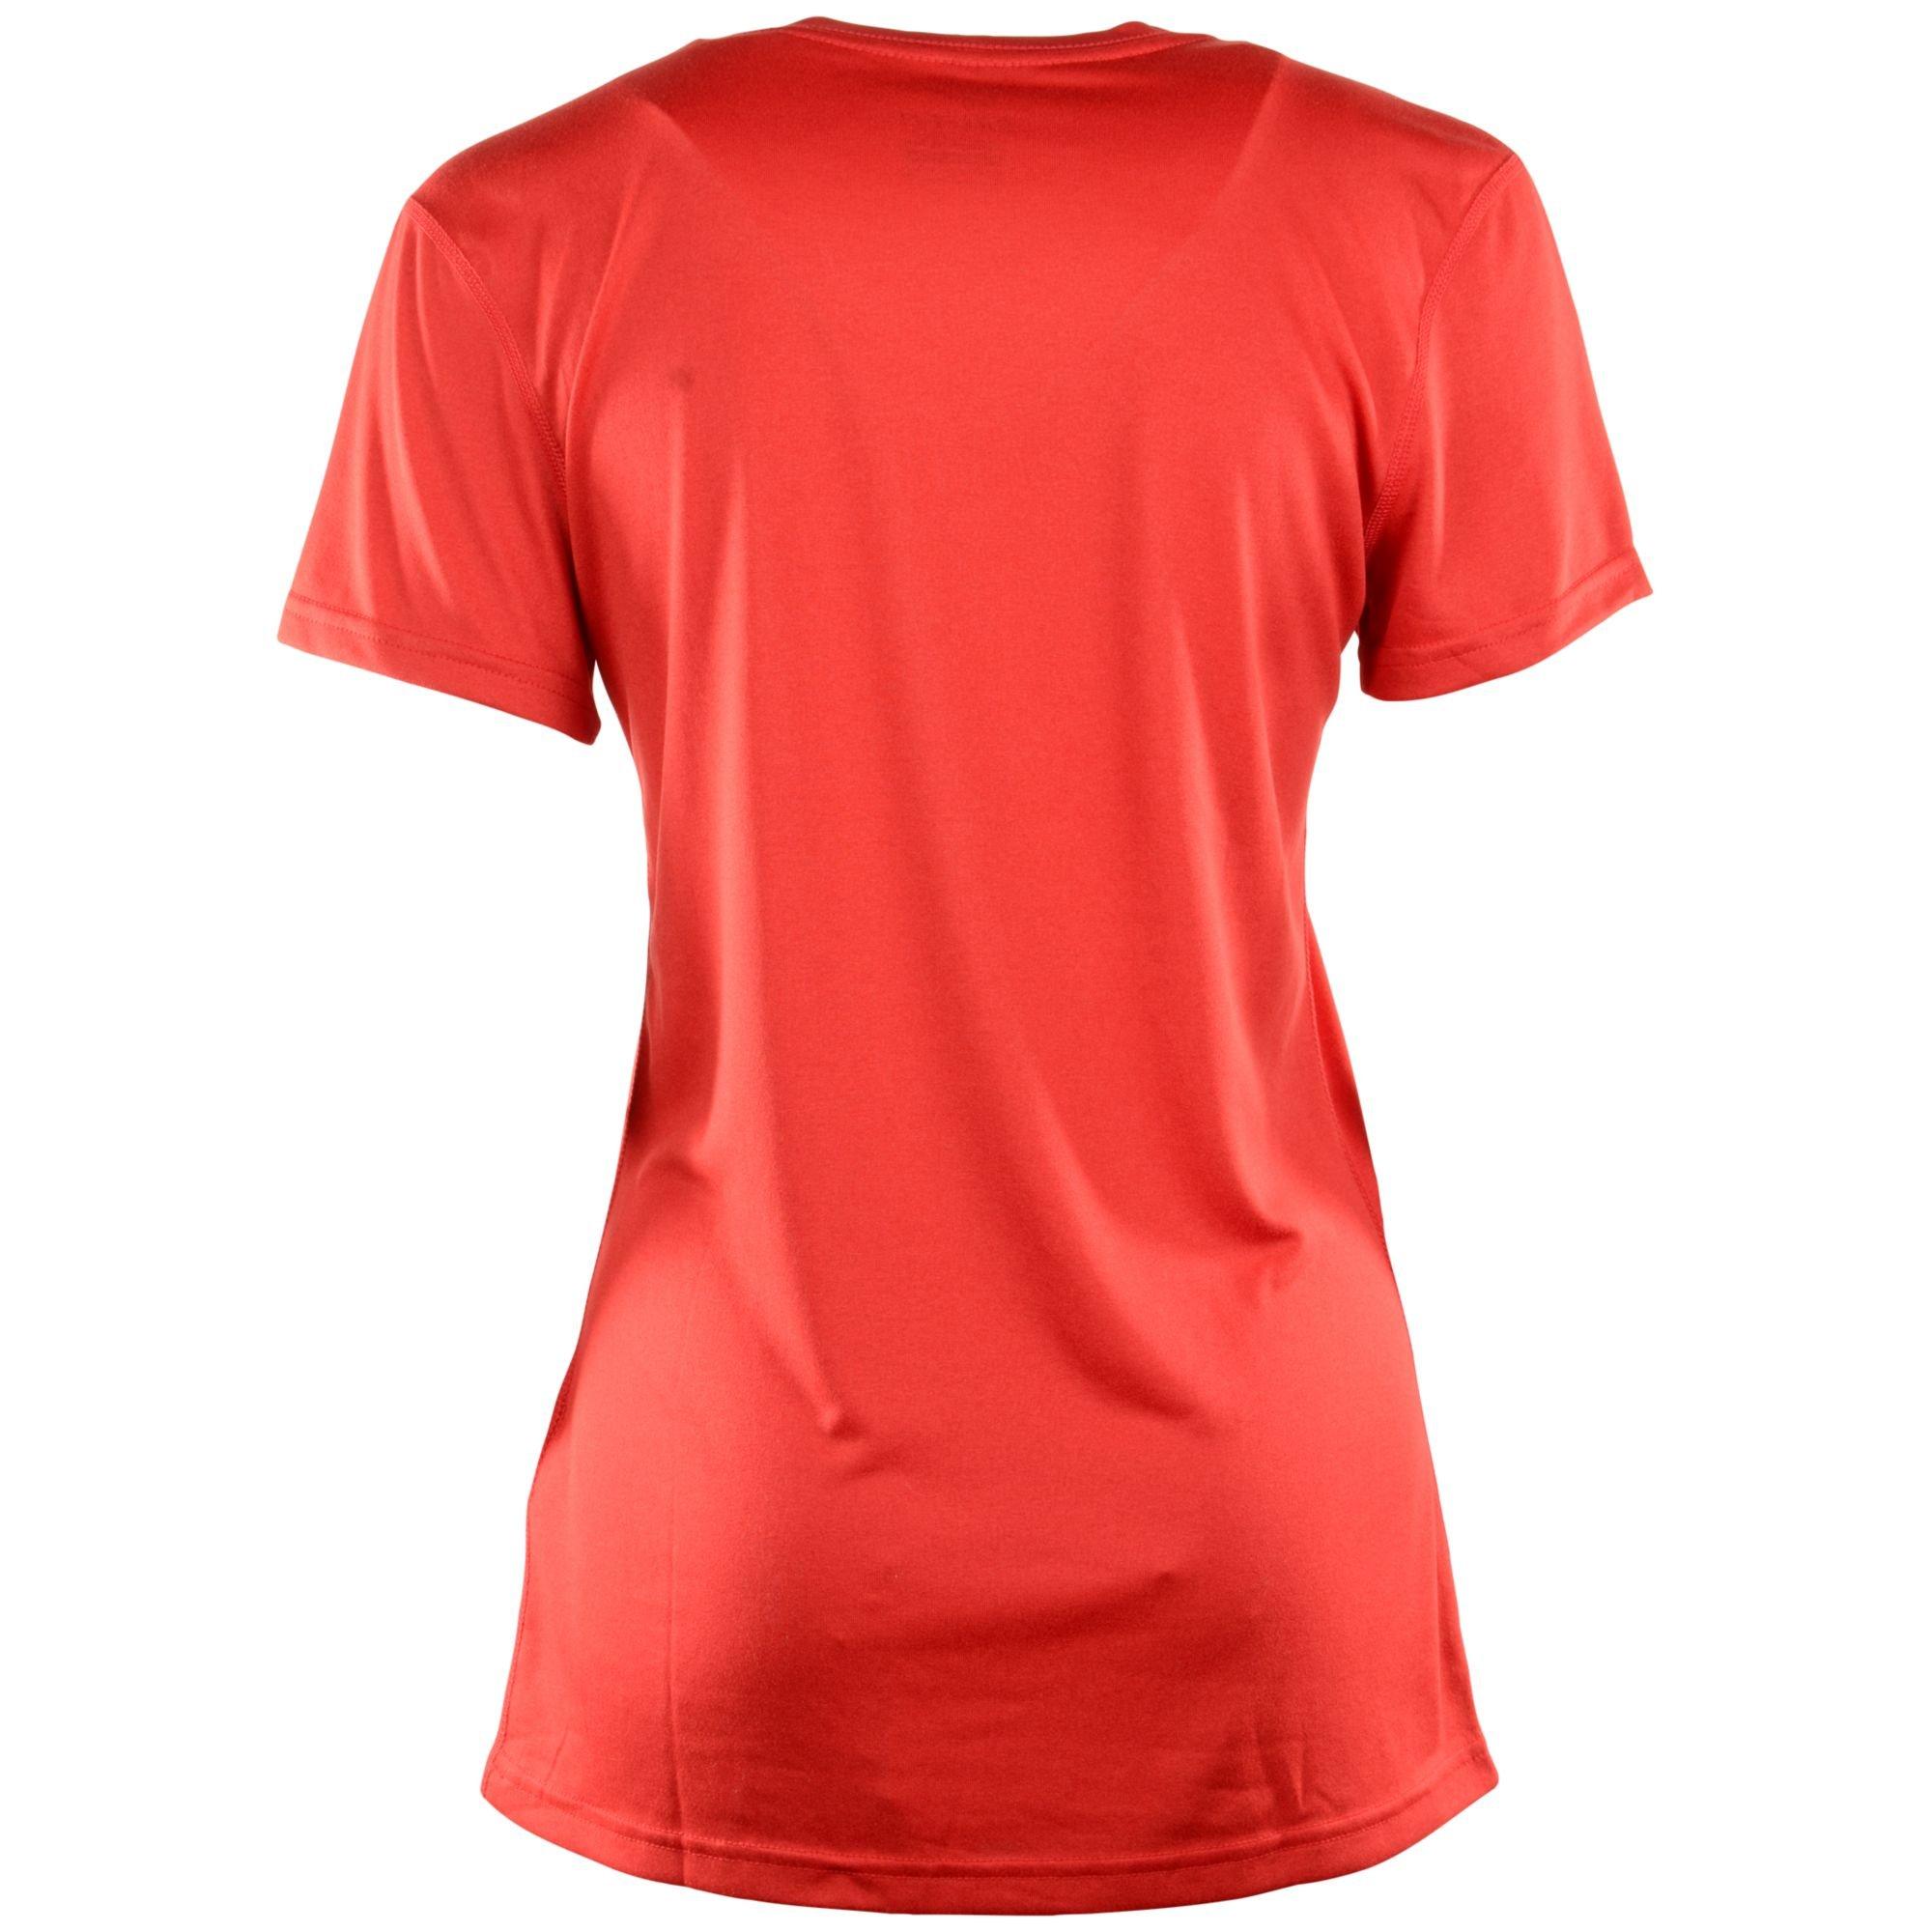 nike women 39 s short sleeve st louis cardinals dri fit legend t shirt in red lyst. Black Bedroom Furniture Sets. Home Design Ideas